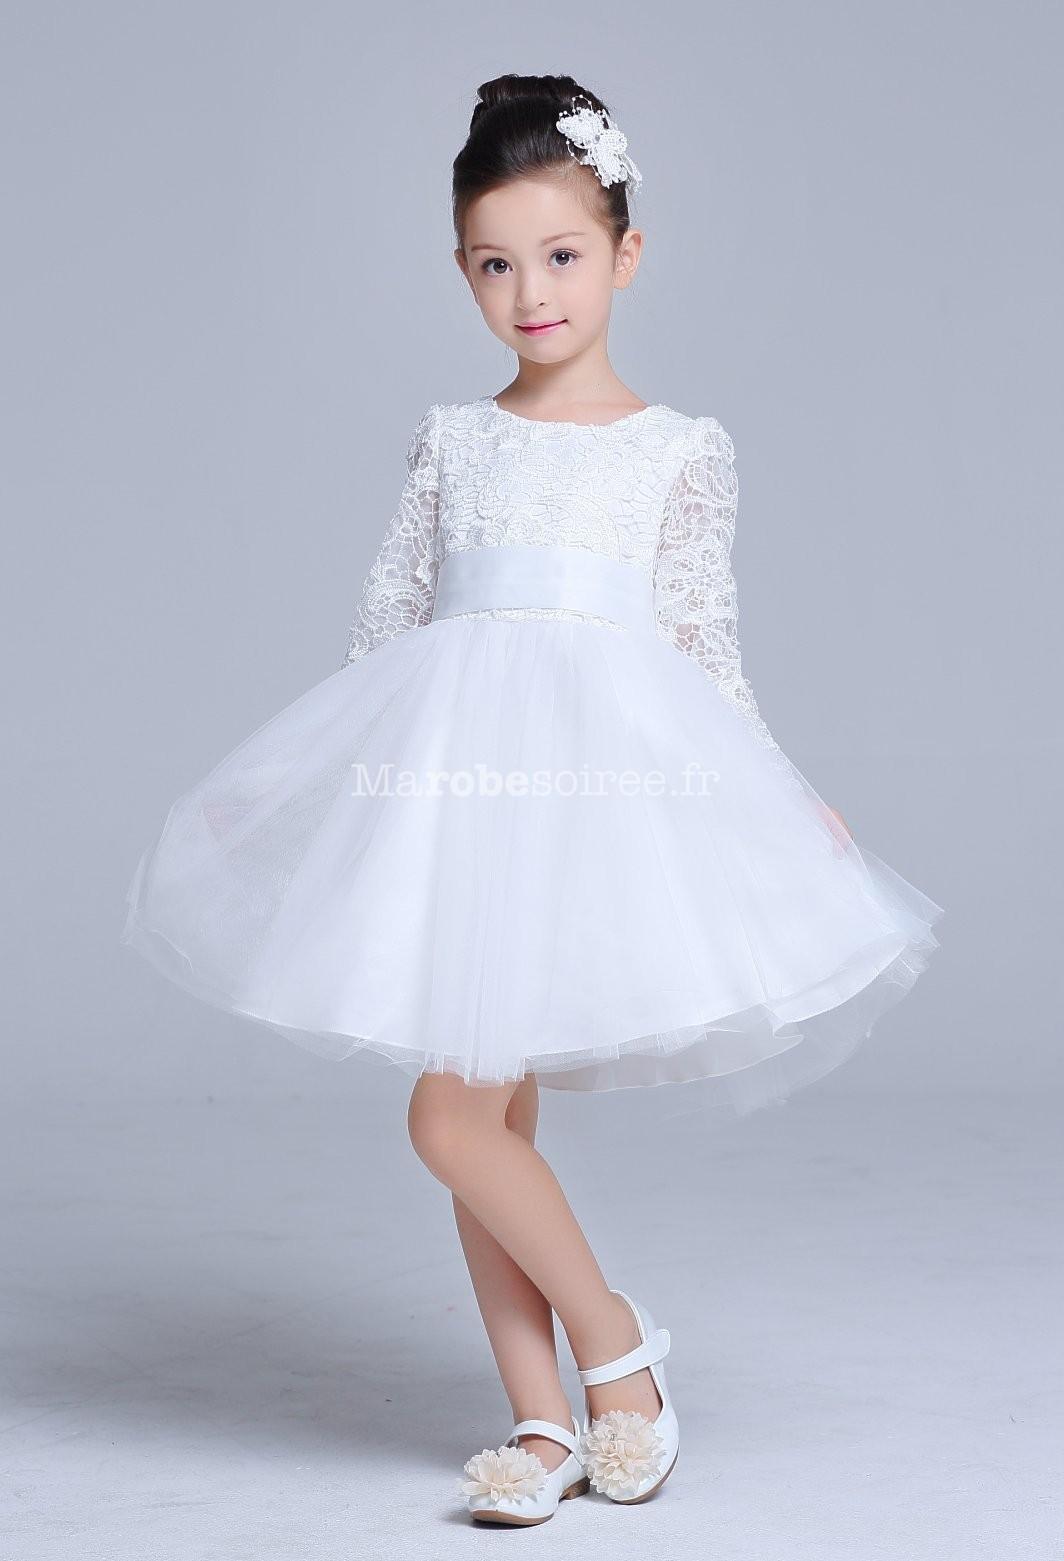 f40cd06555d9b Robe fille pour un mariage - Vêtement Aliexpress